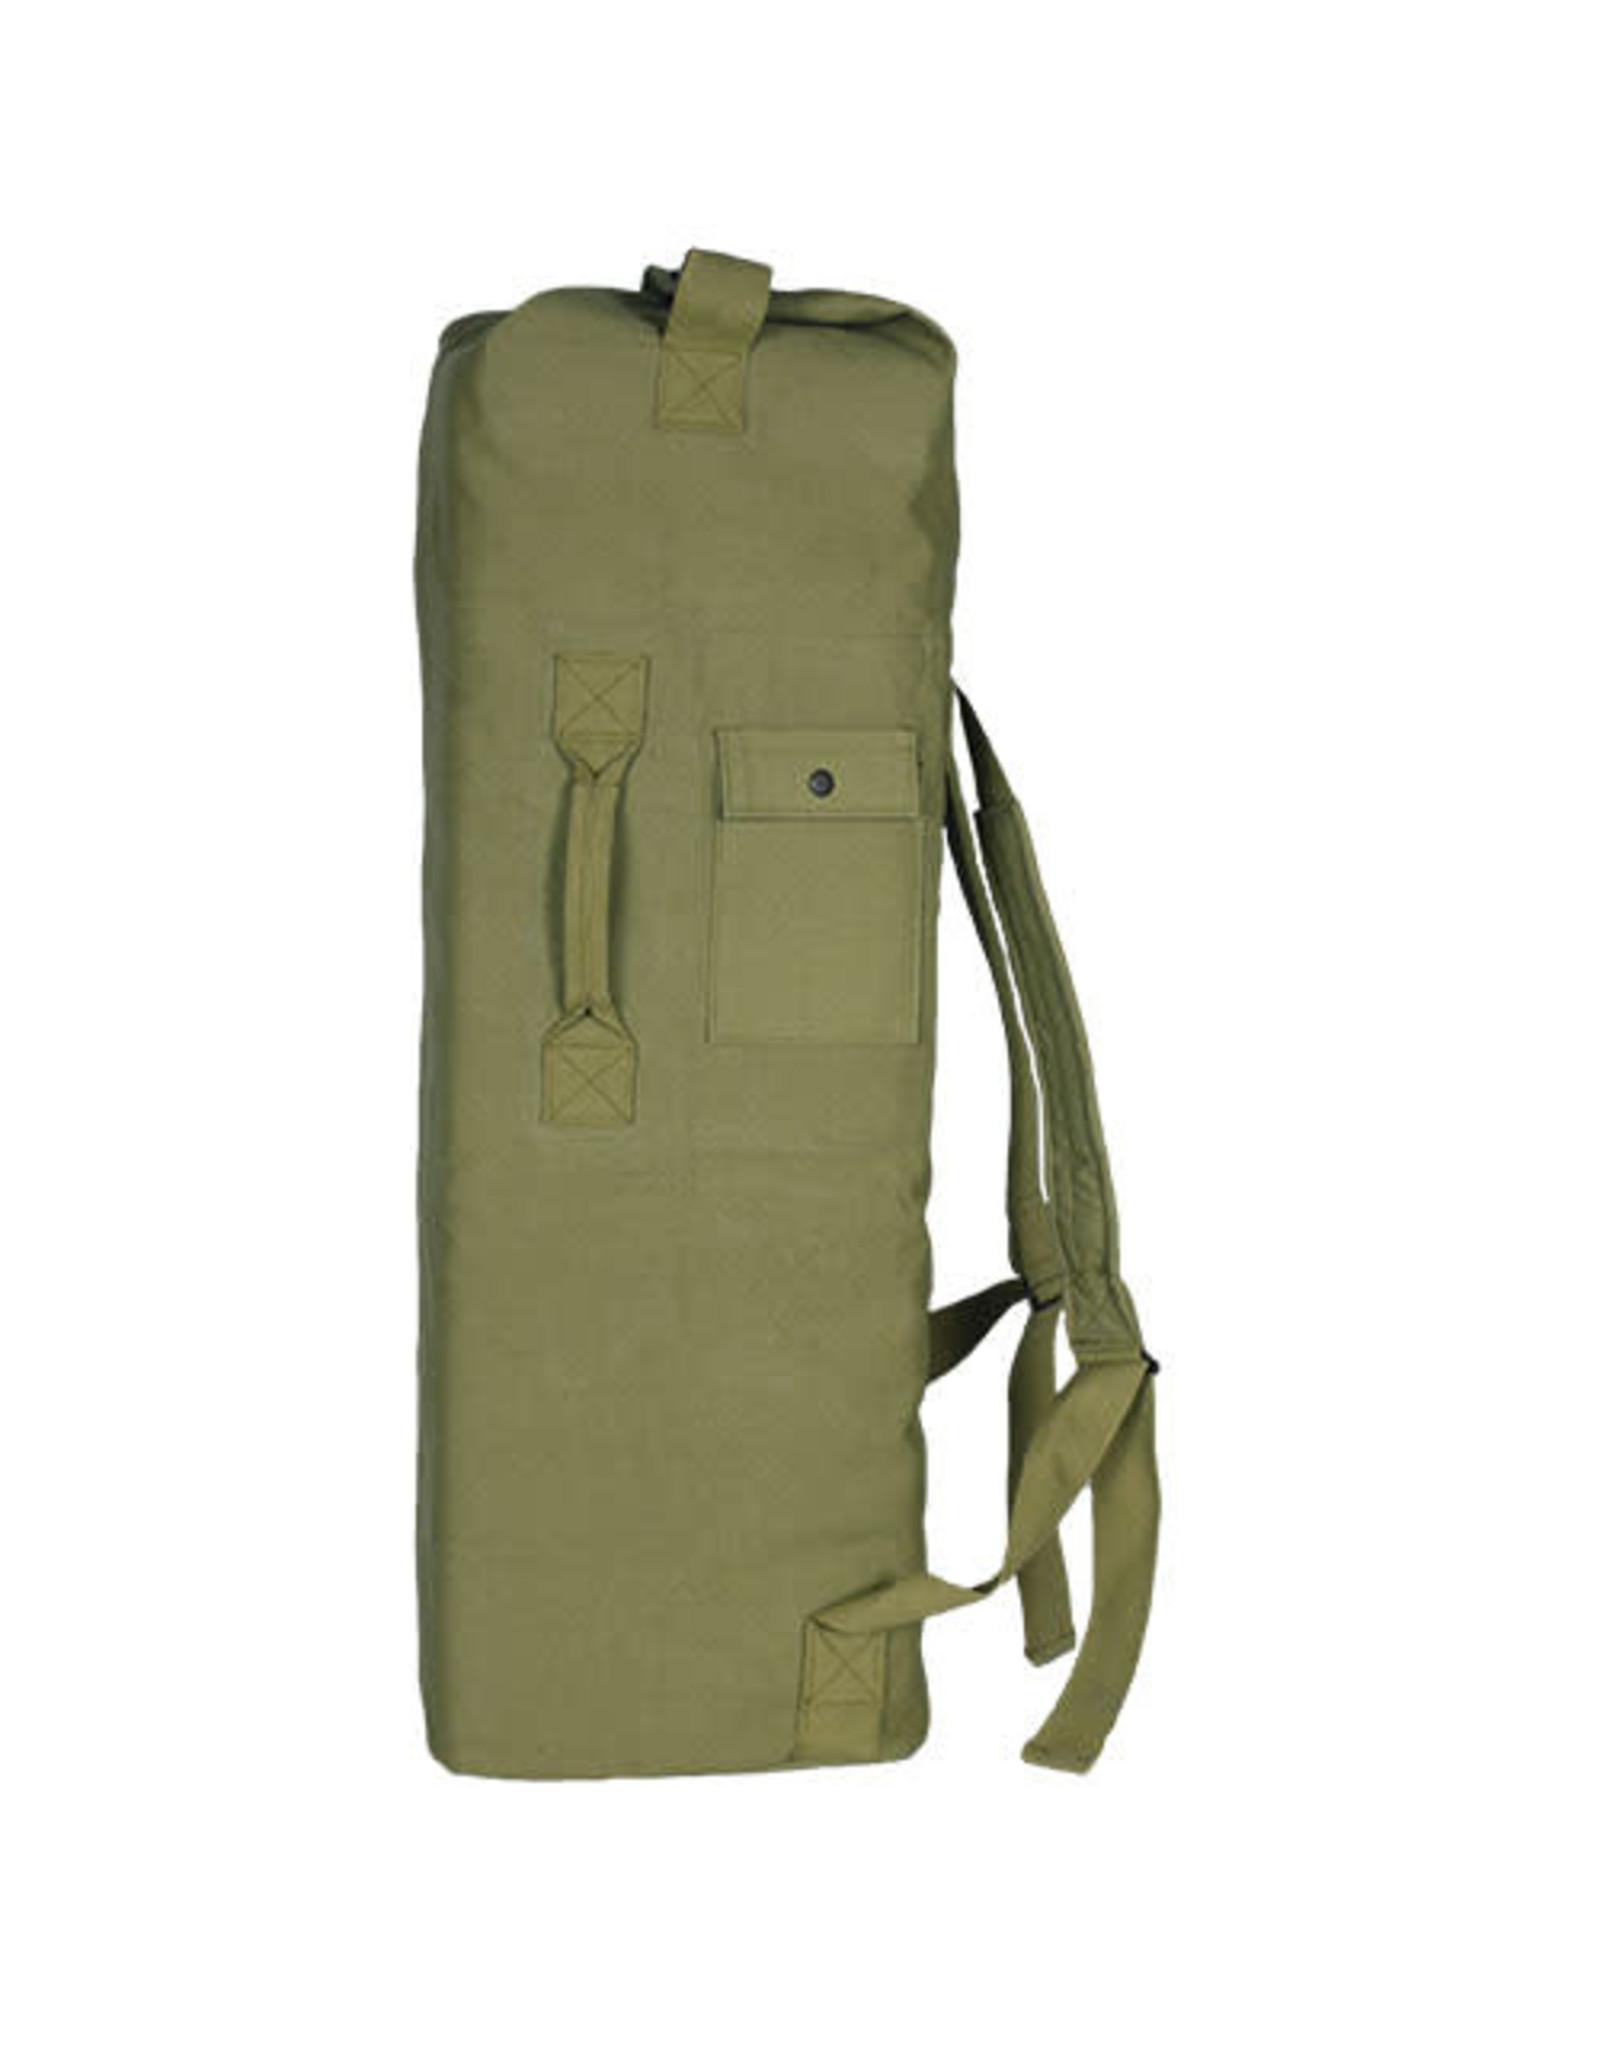 GI Canvas 2 Strap Duffel Bag